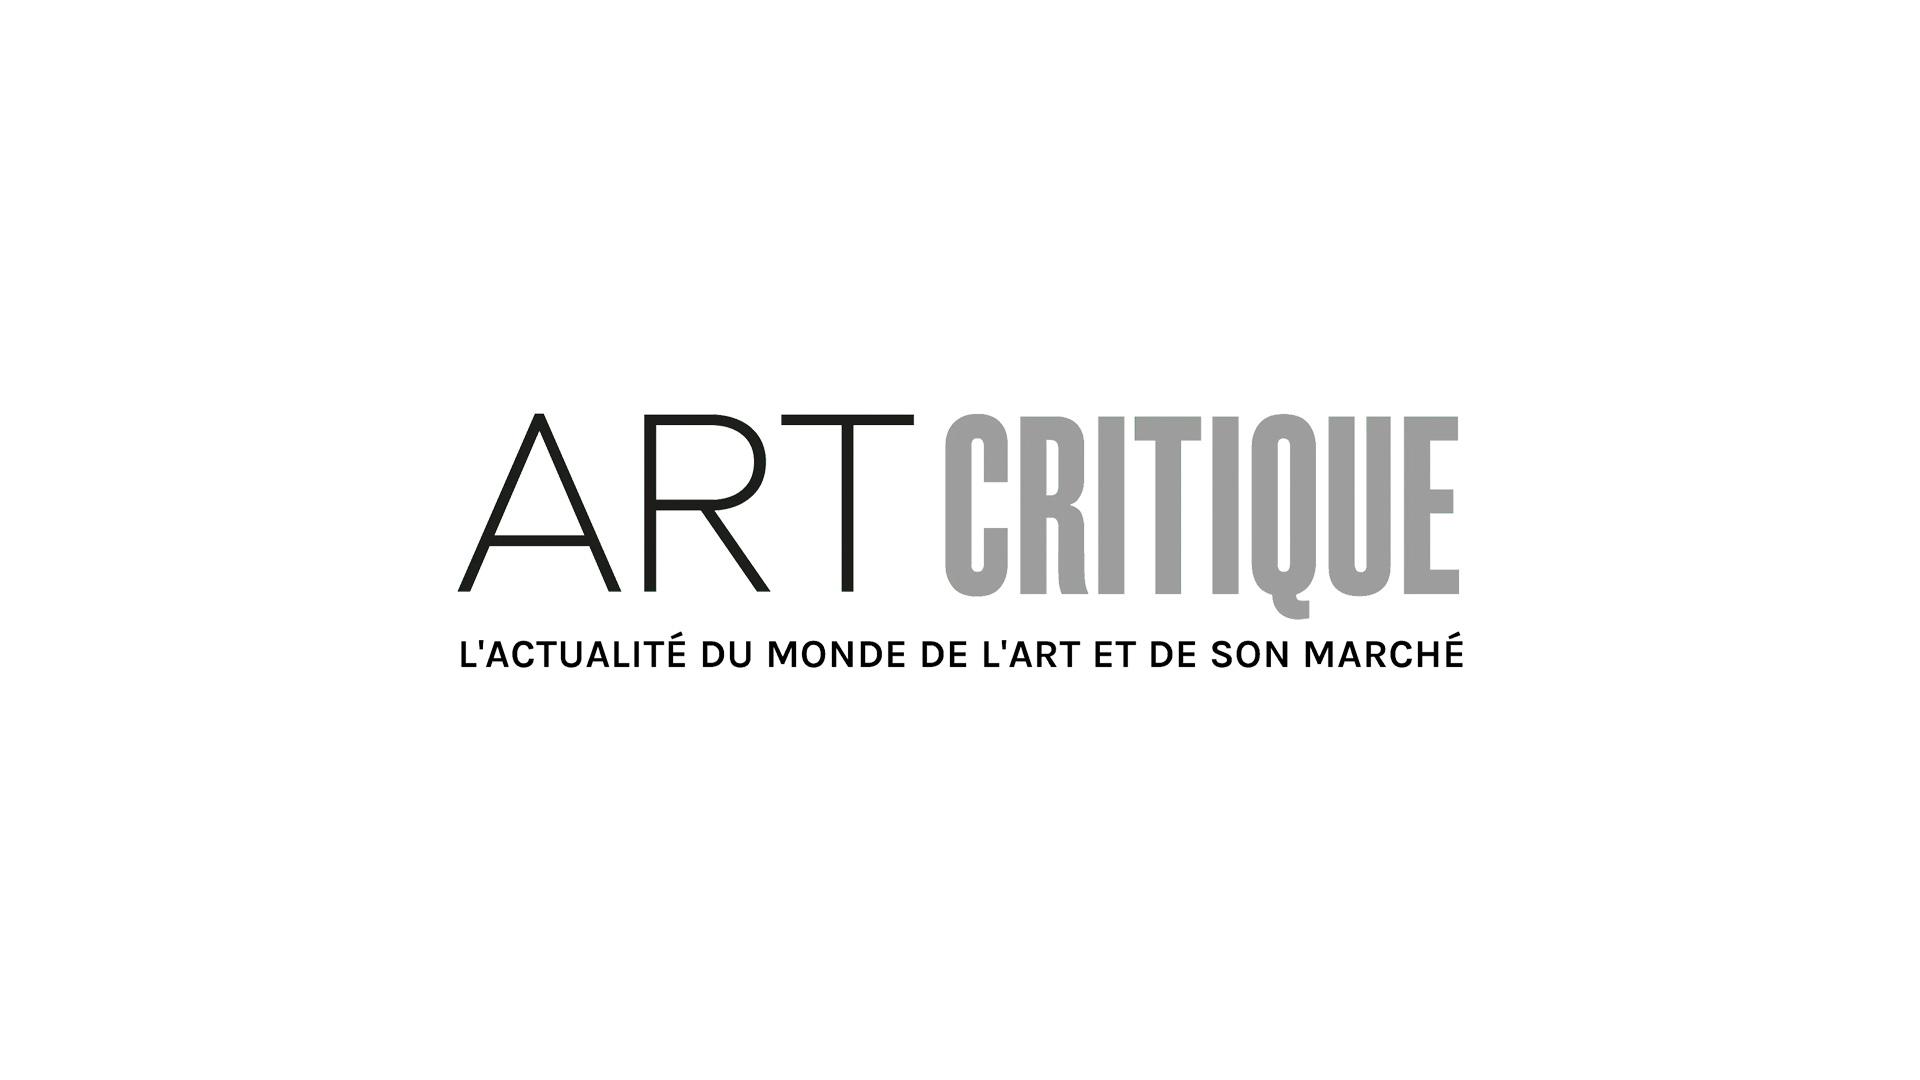 France blocks export of Cimabue masterpiece found in kitchen